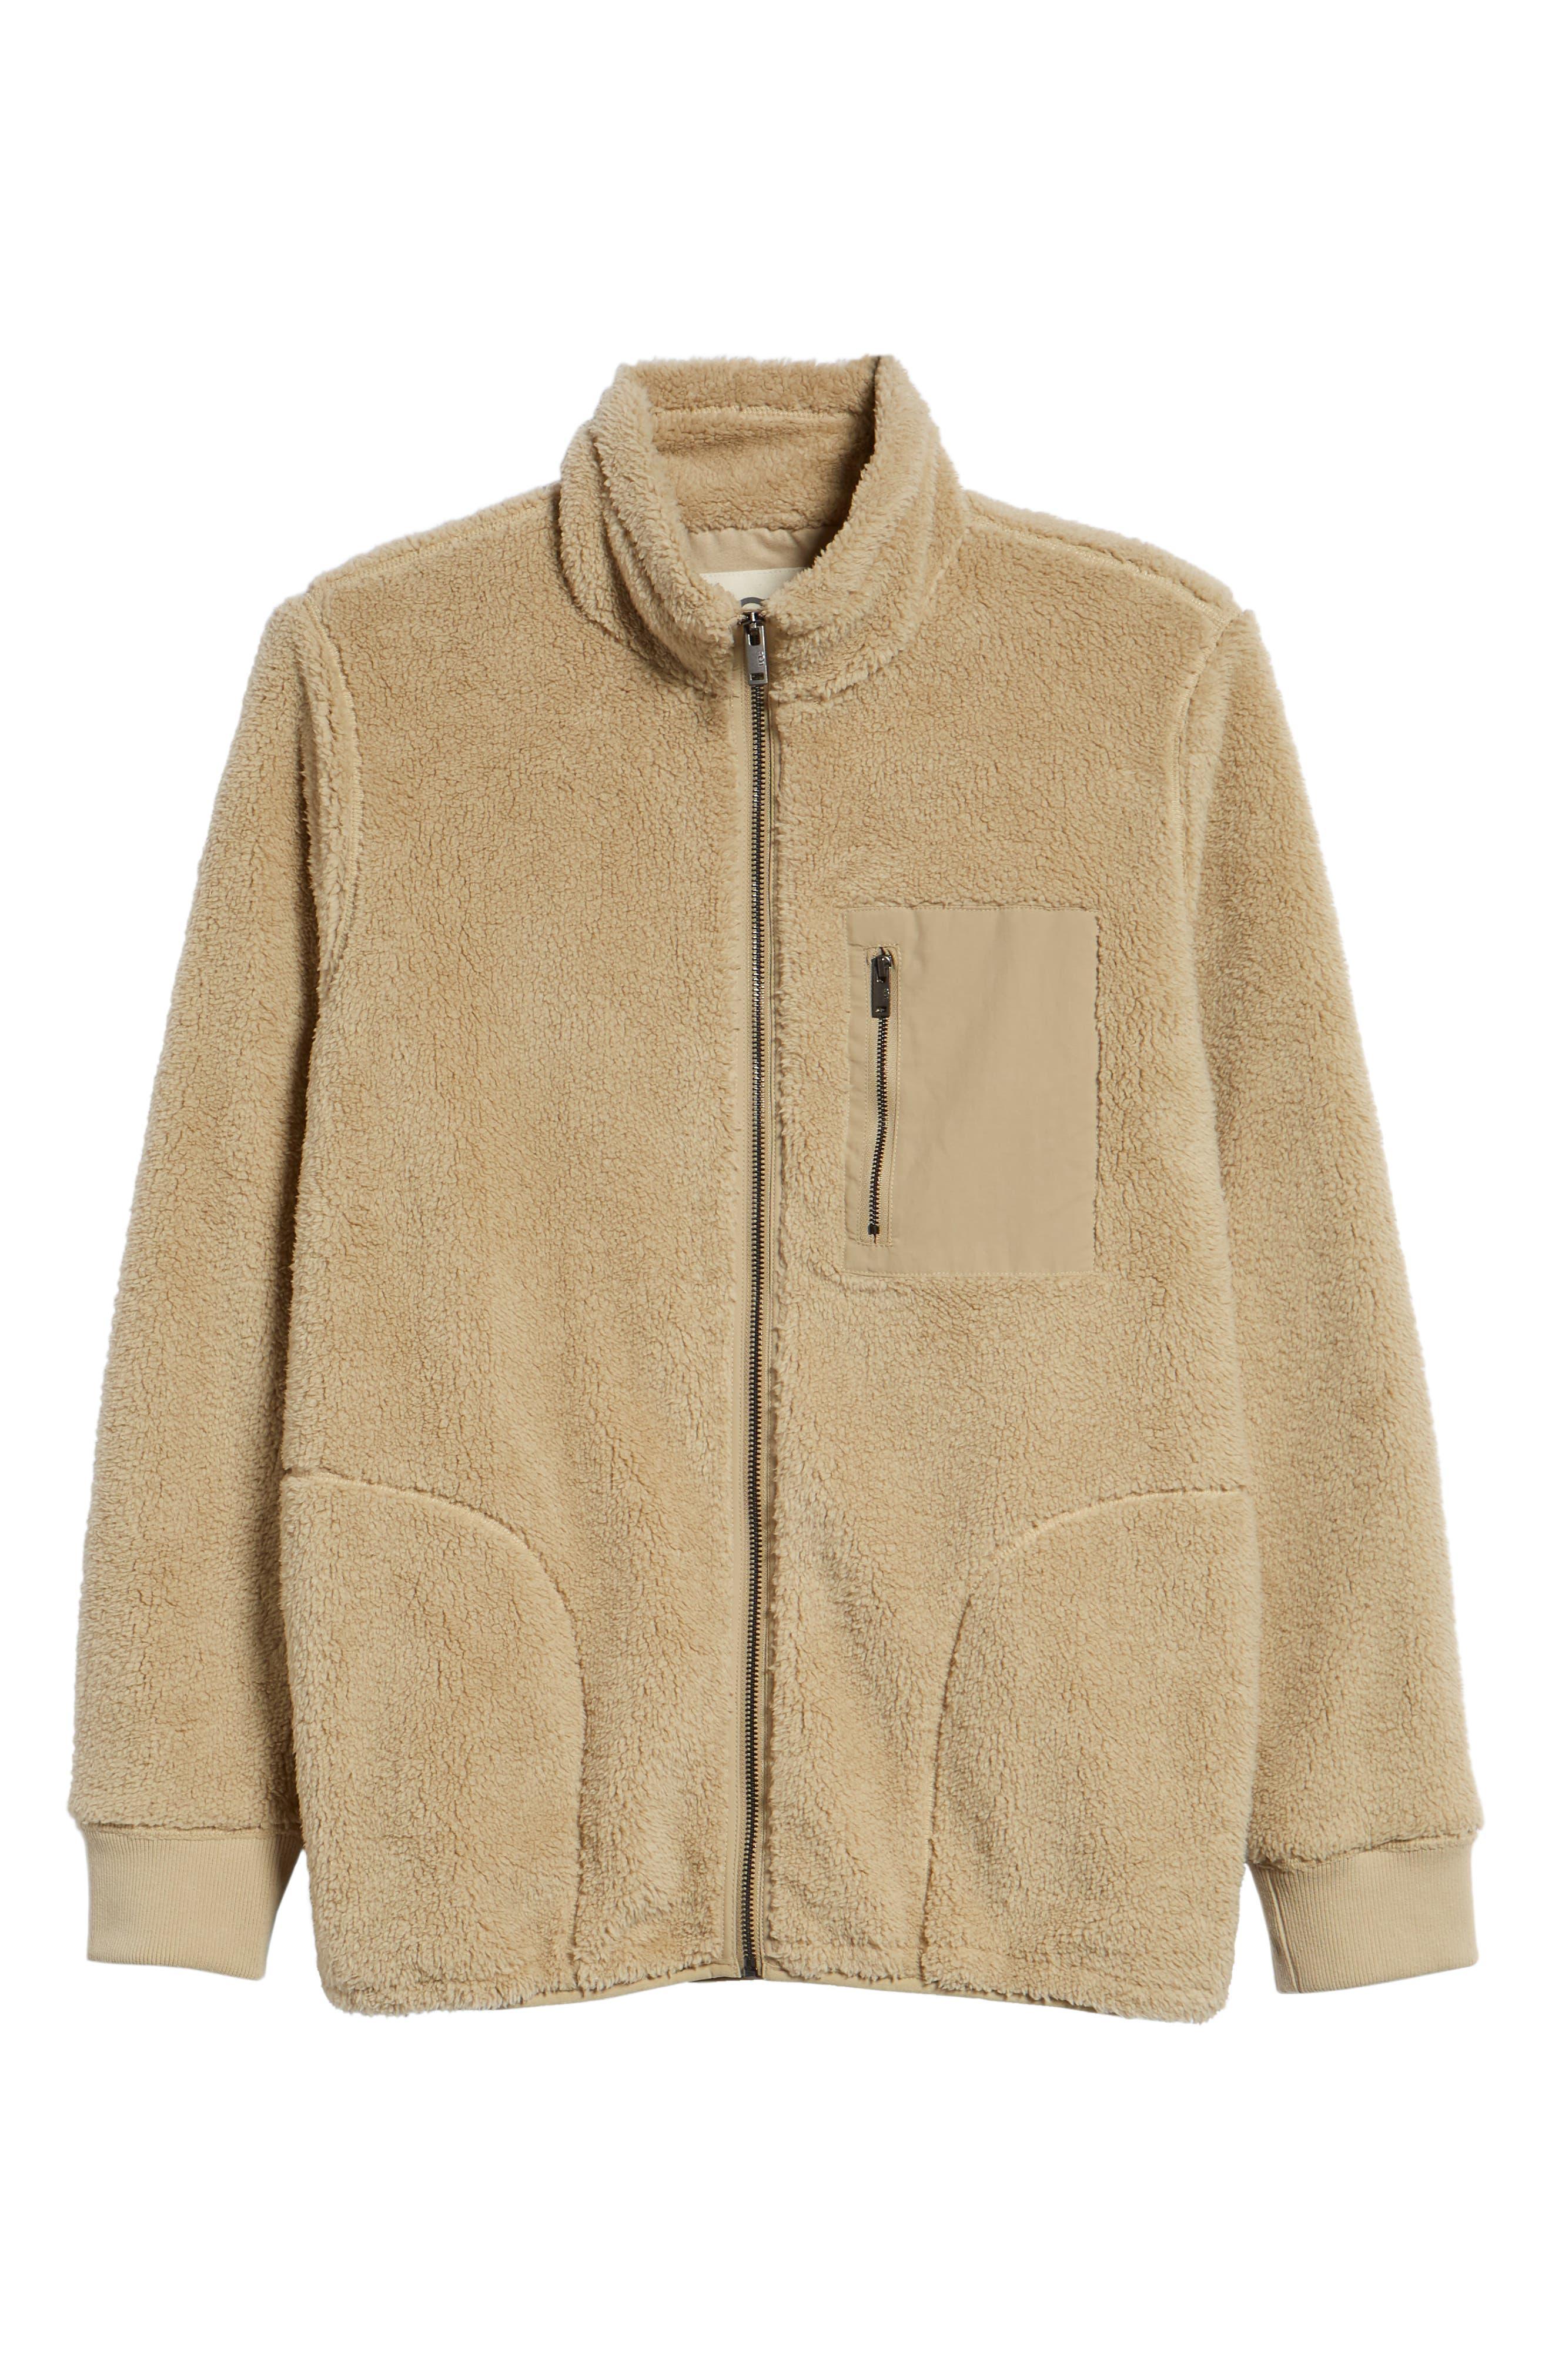 Lucas High Pile Fleece Sweater Jacket,                             Alternate thumbnail 6, color,                             SAND